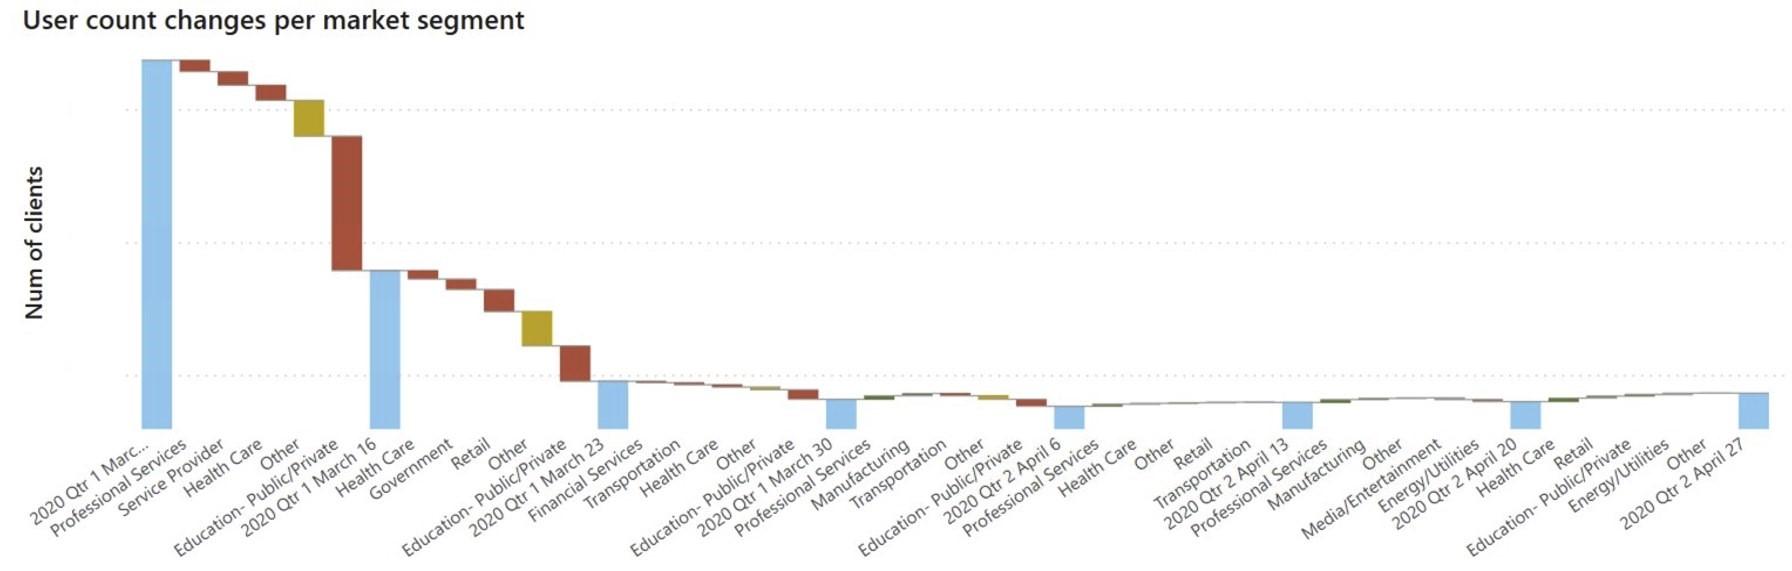 User count changes per market segment